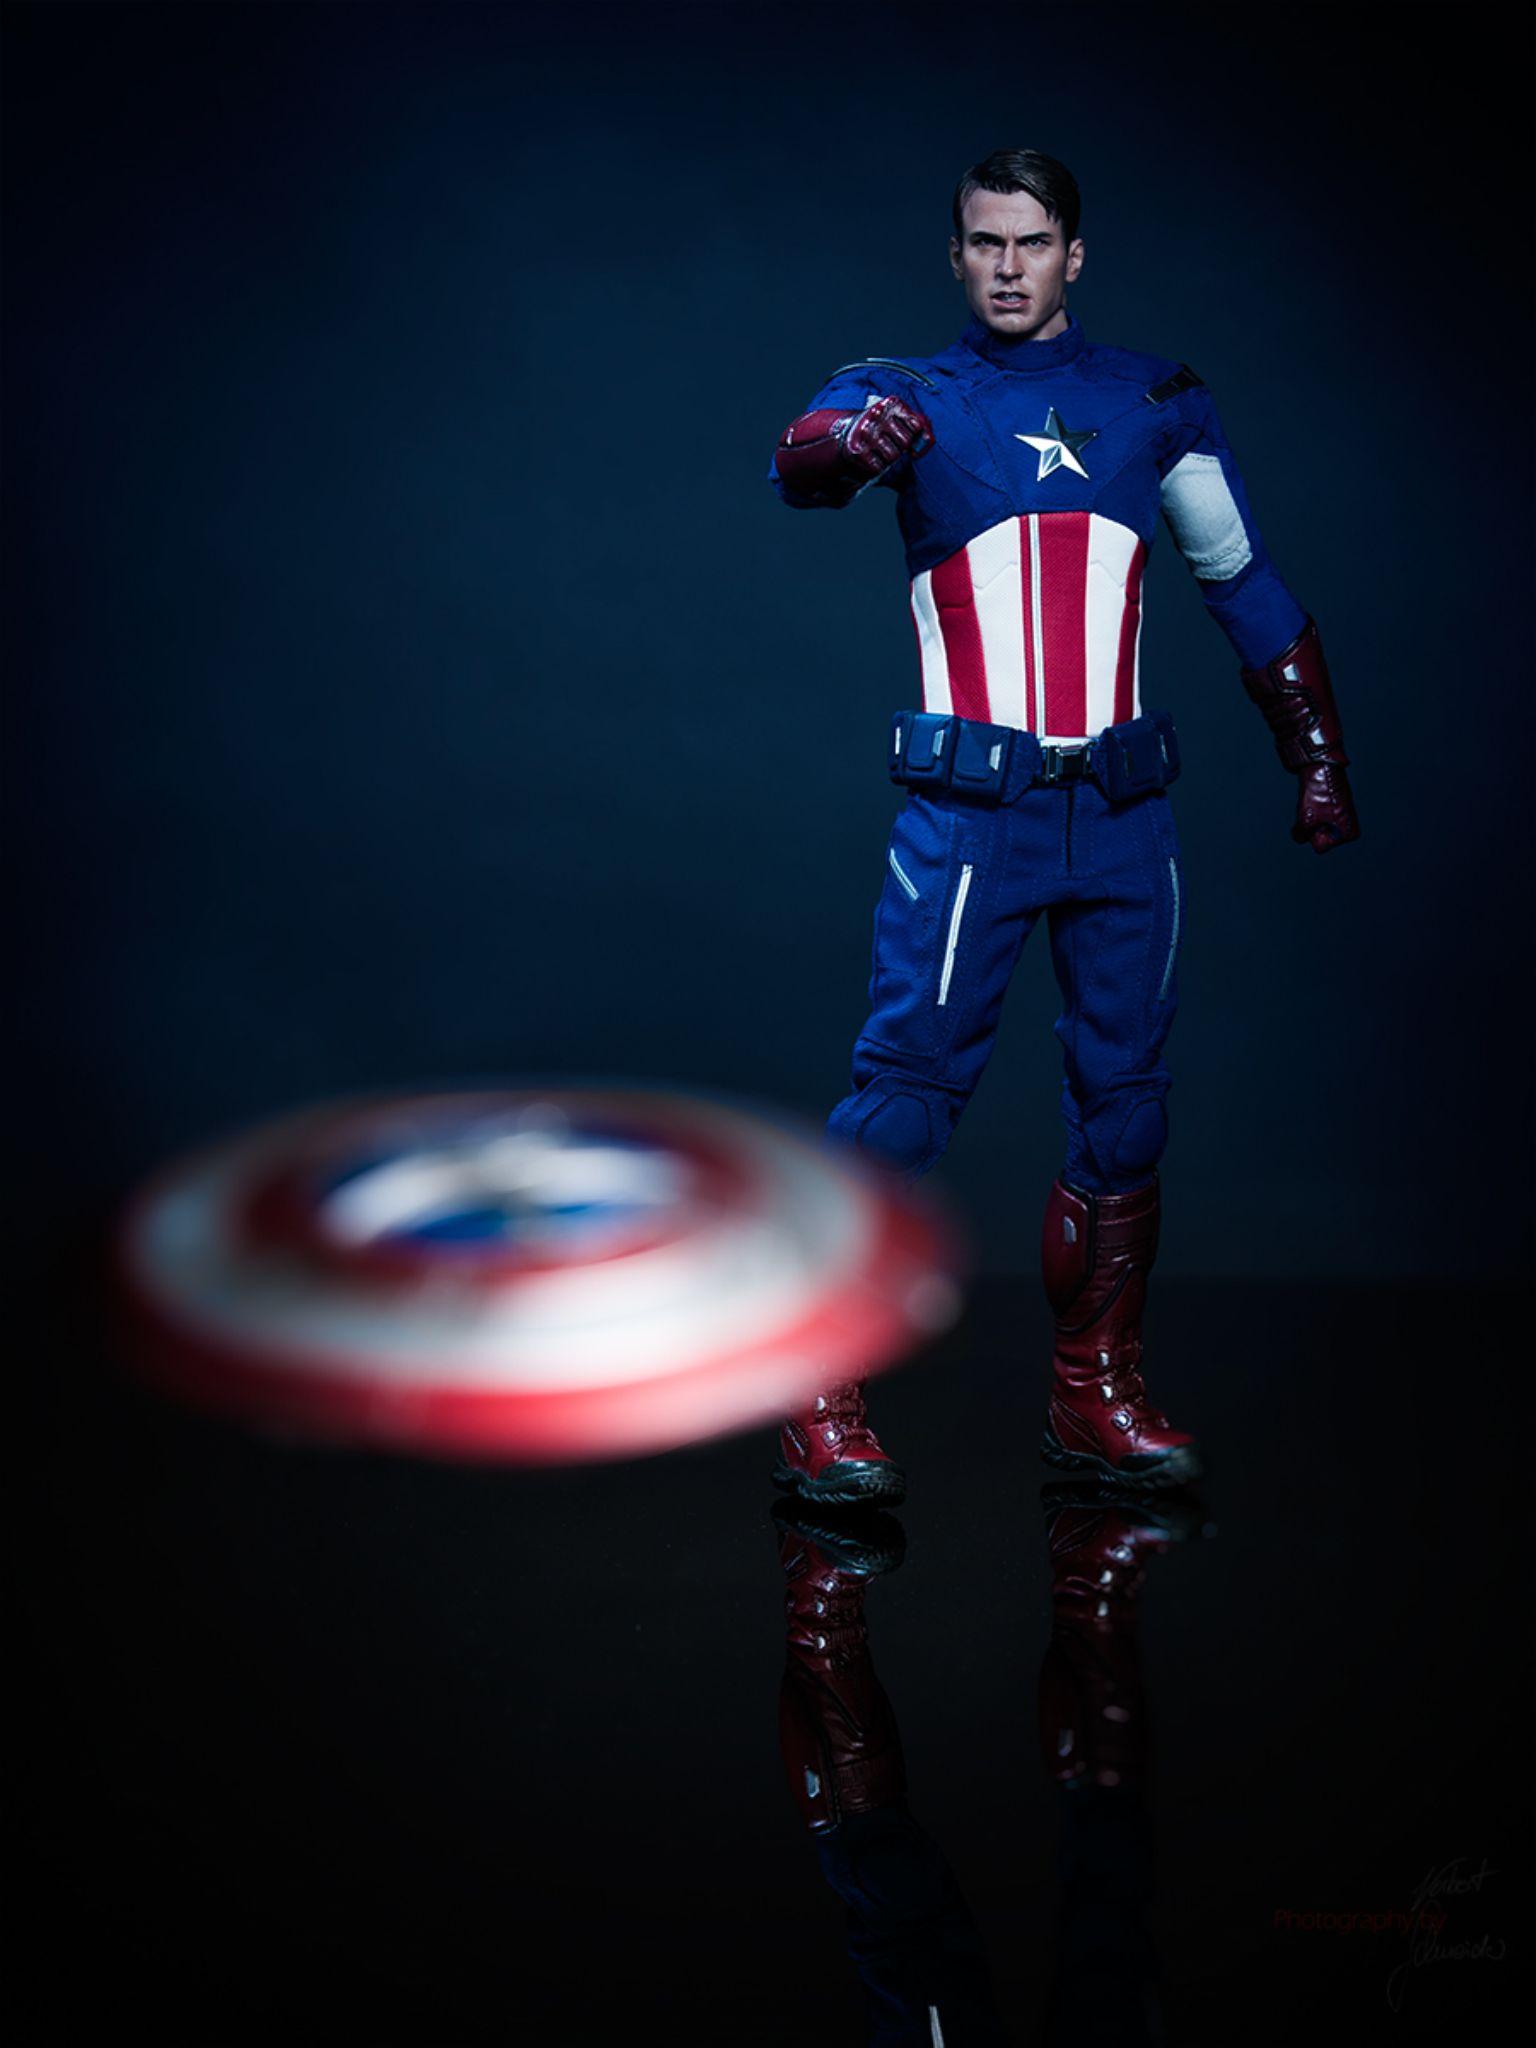 Captain America by Norbert Schneider